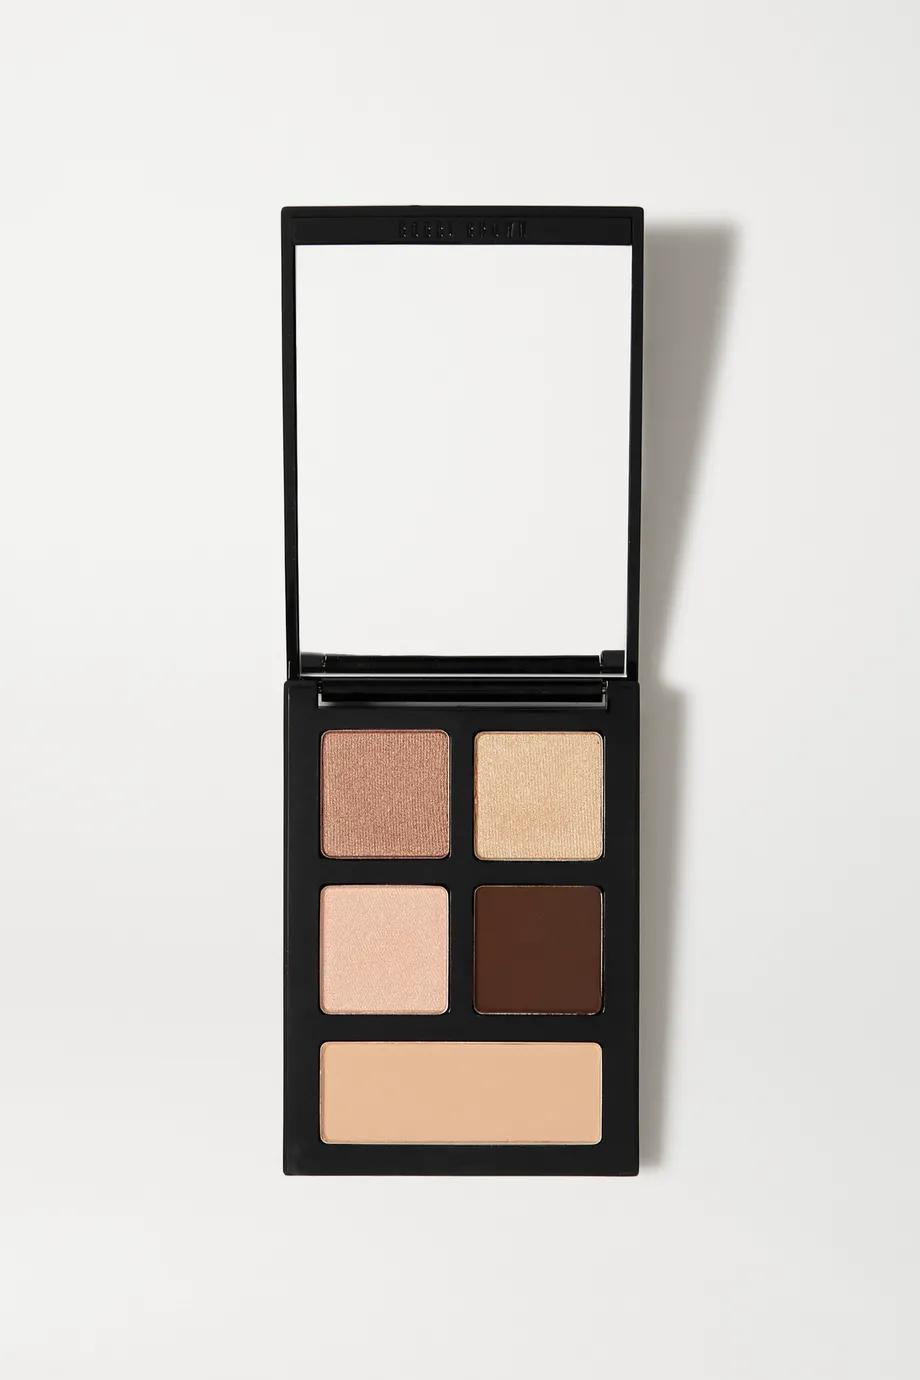 Bronze The Essential Multicolor Eye Shadow Palette - Burnished Bronze   Bobbi Brown   NET-A-PORTER